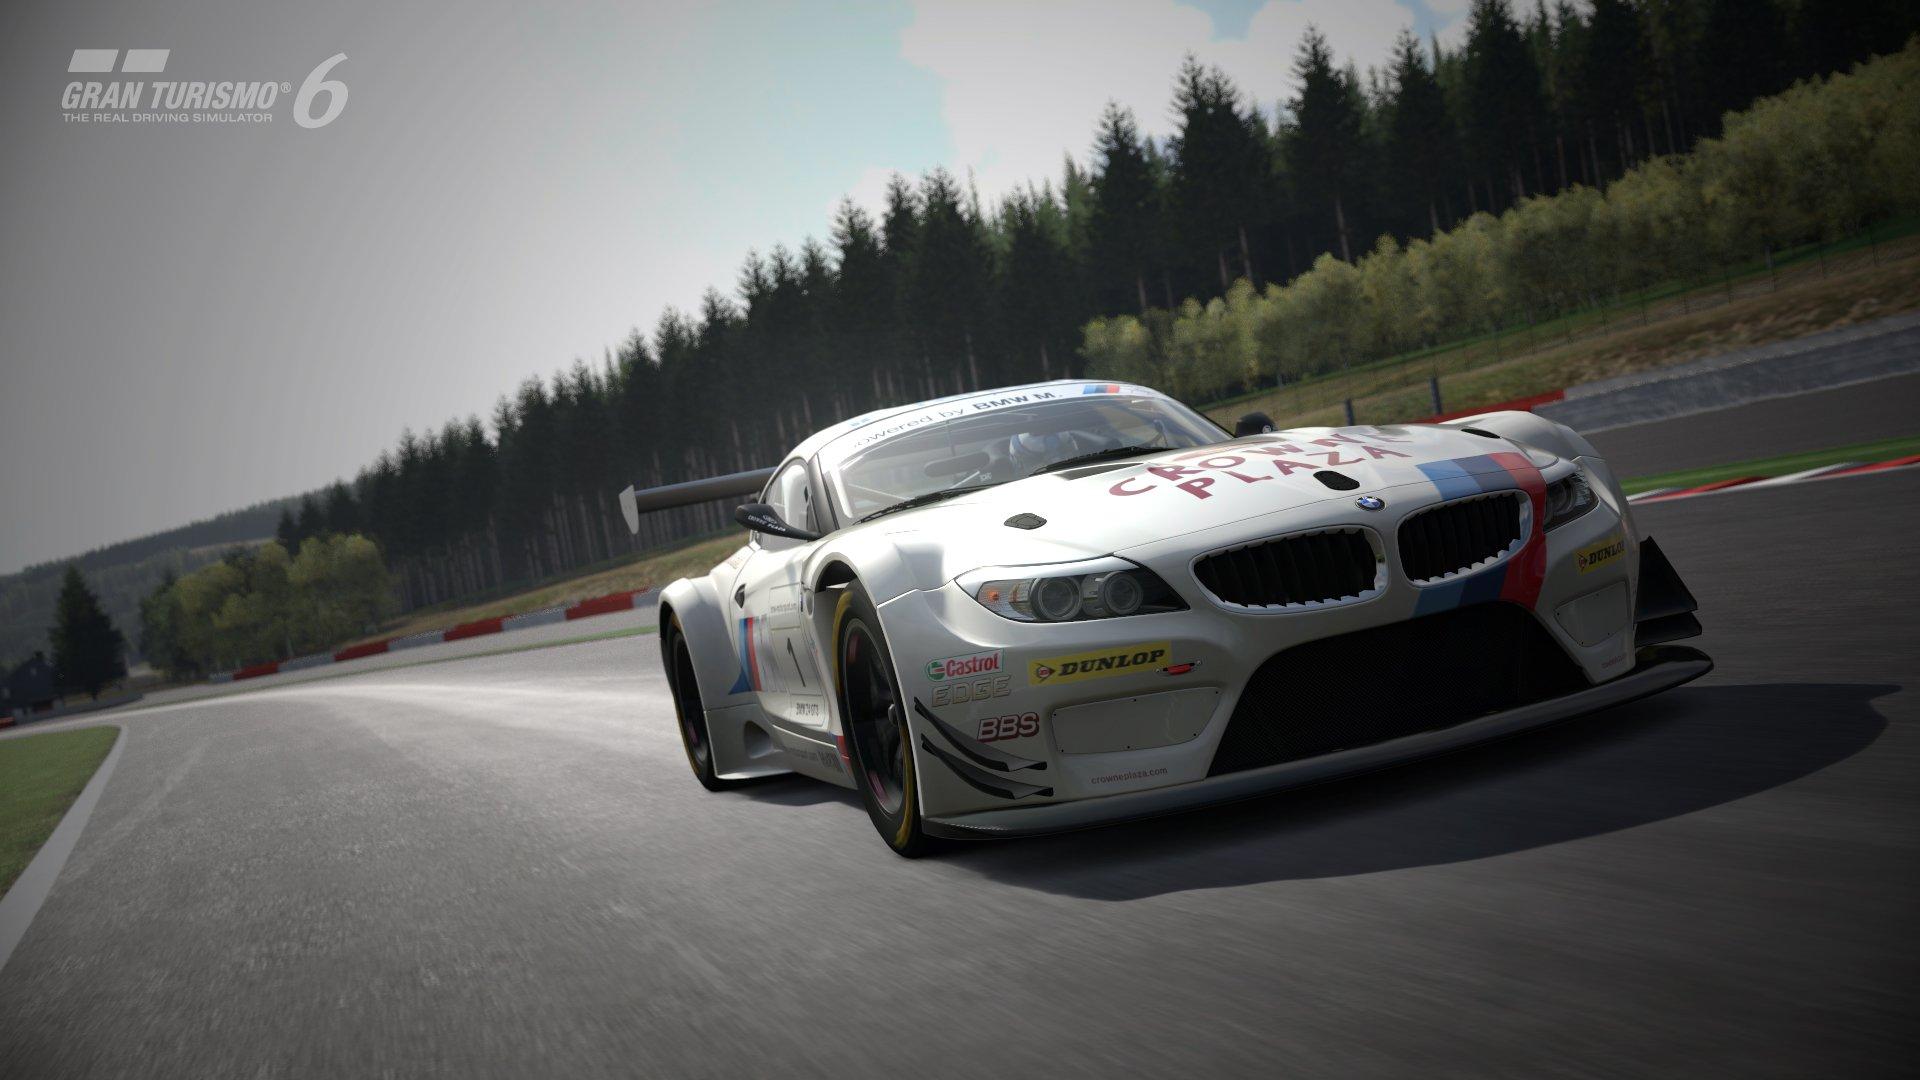 Gran Turismo 6 review